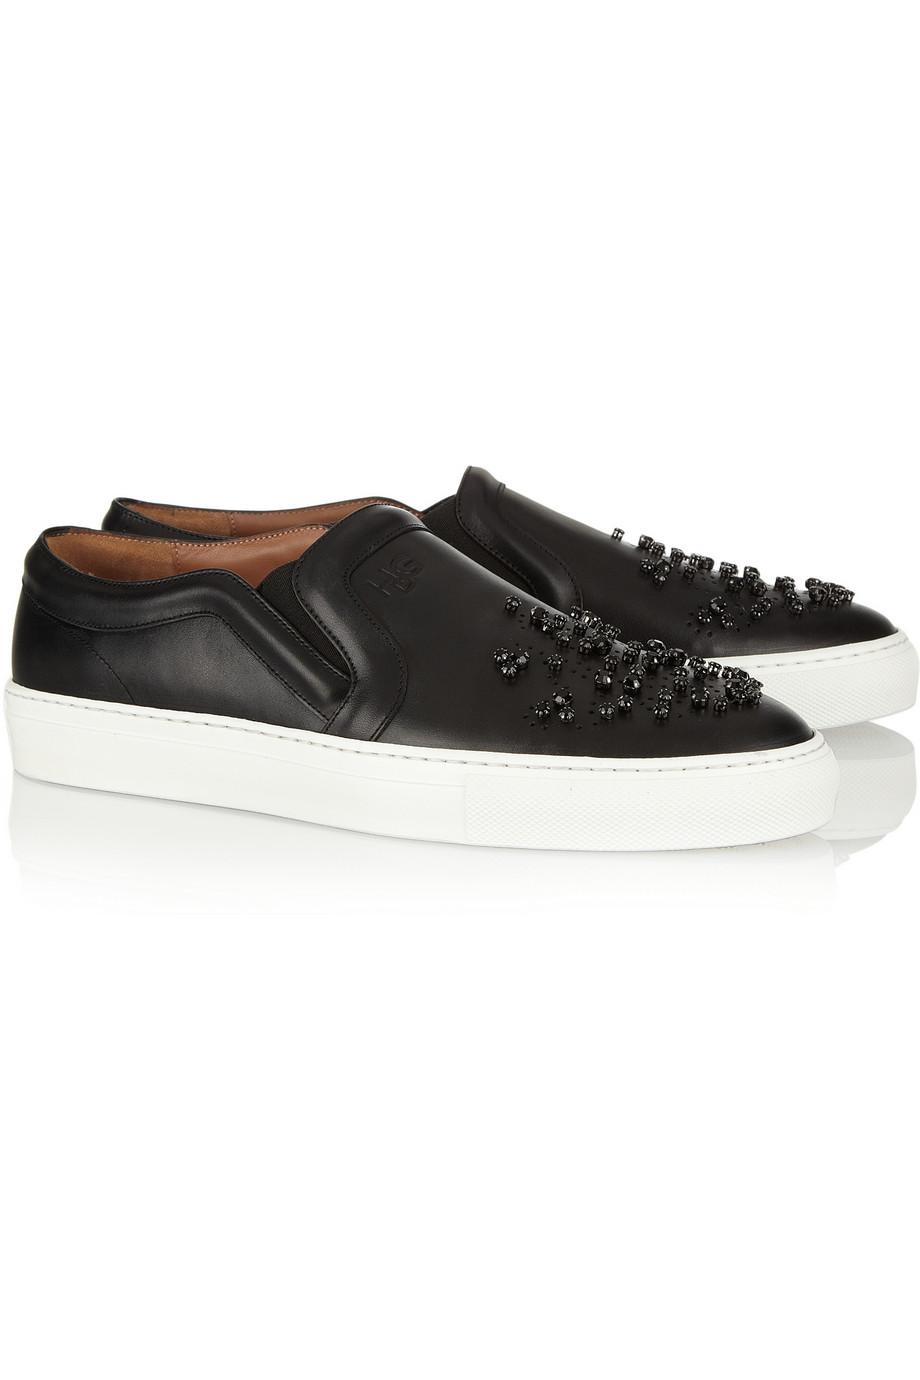 givenchy skate shoes in embellished black leather